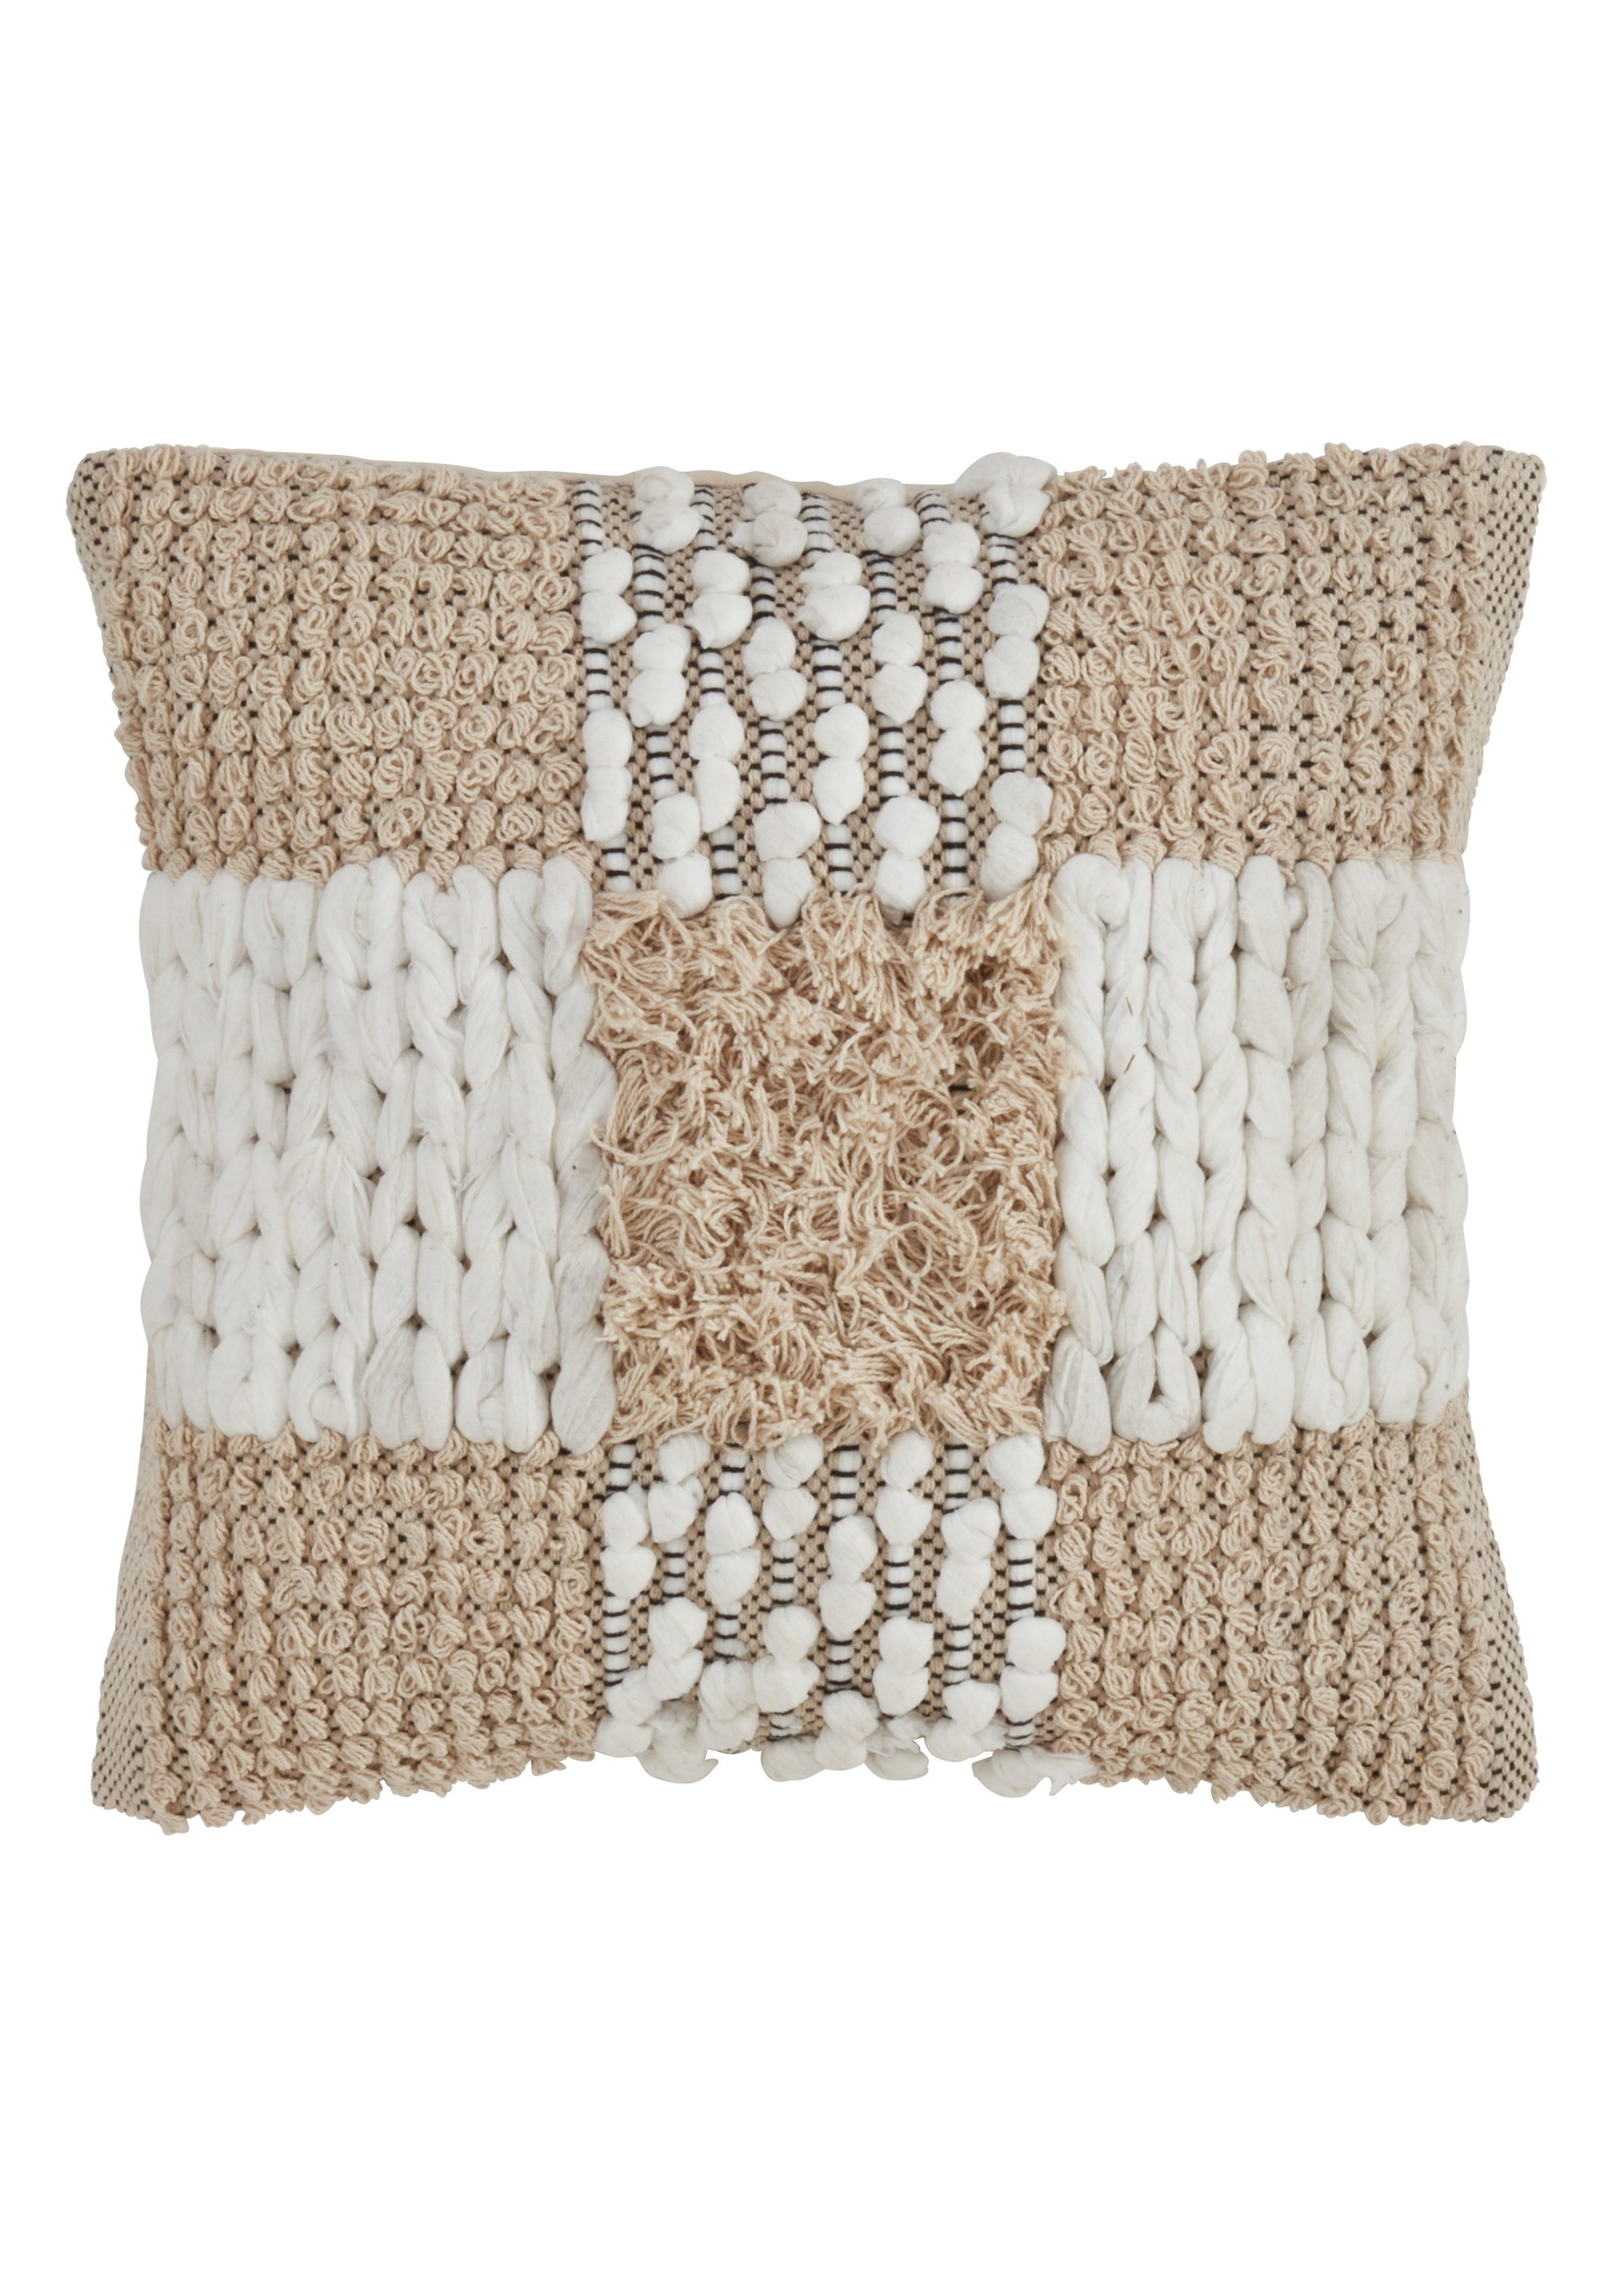 Saro Moroccan Pillow Down Filled Natural